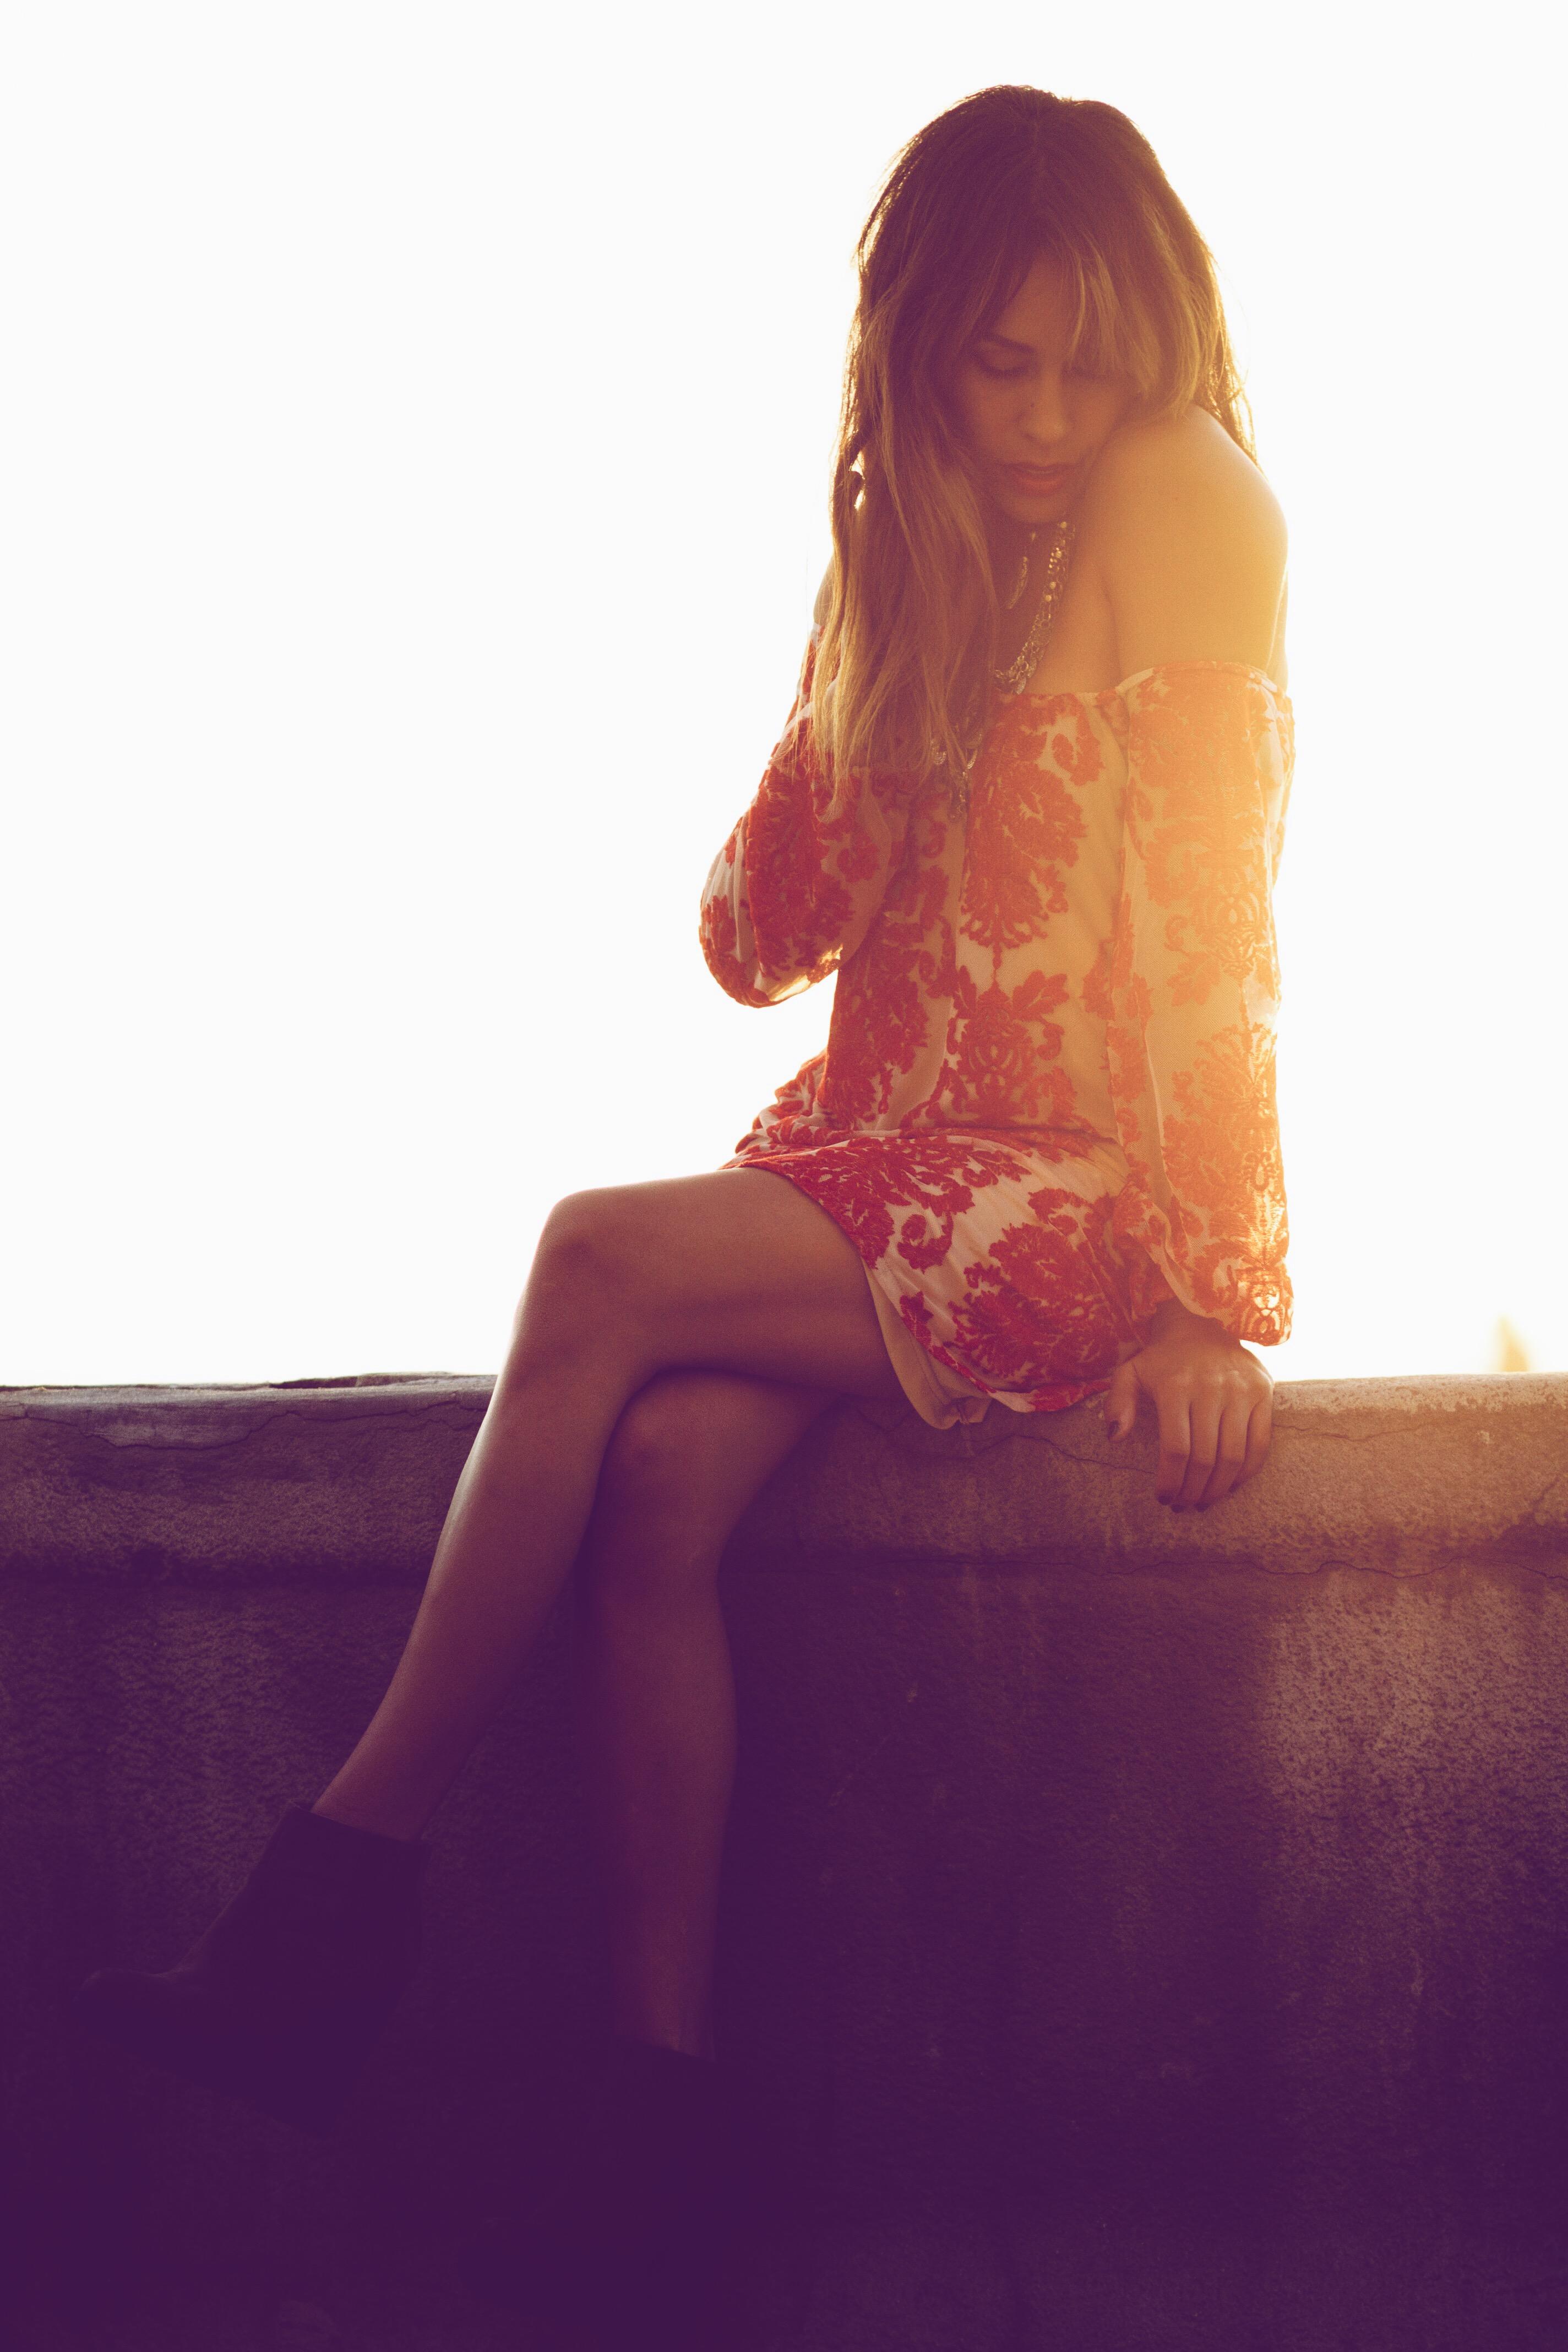 2014_12_15_FashionMuse_FrankVinyl_BargainMission_2V